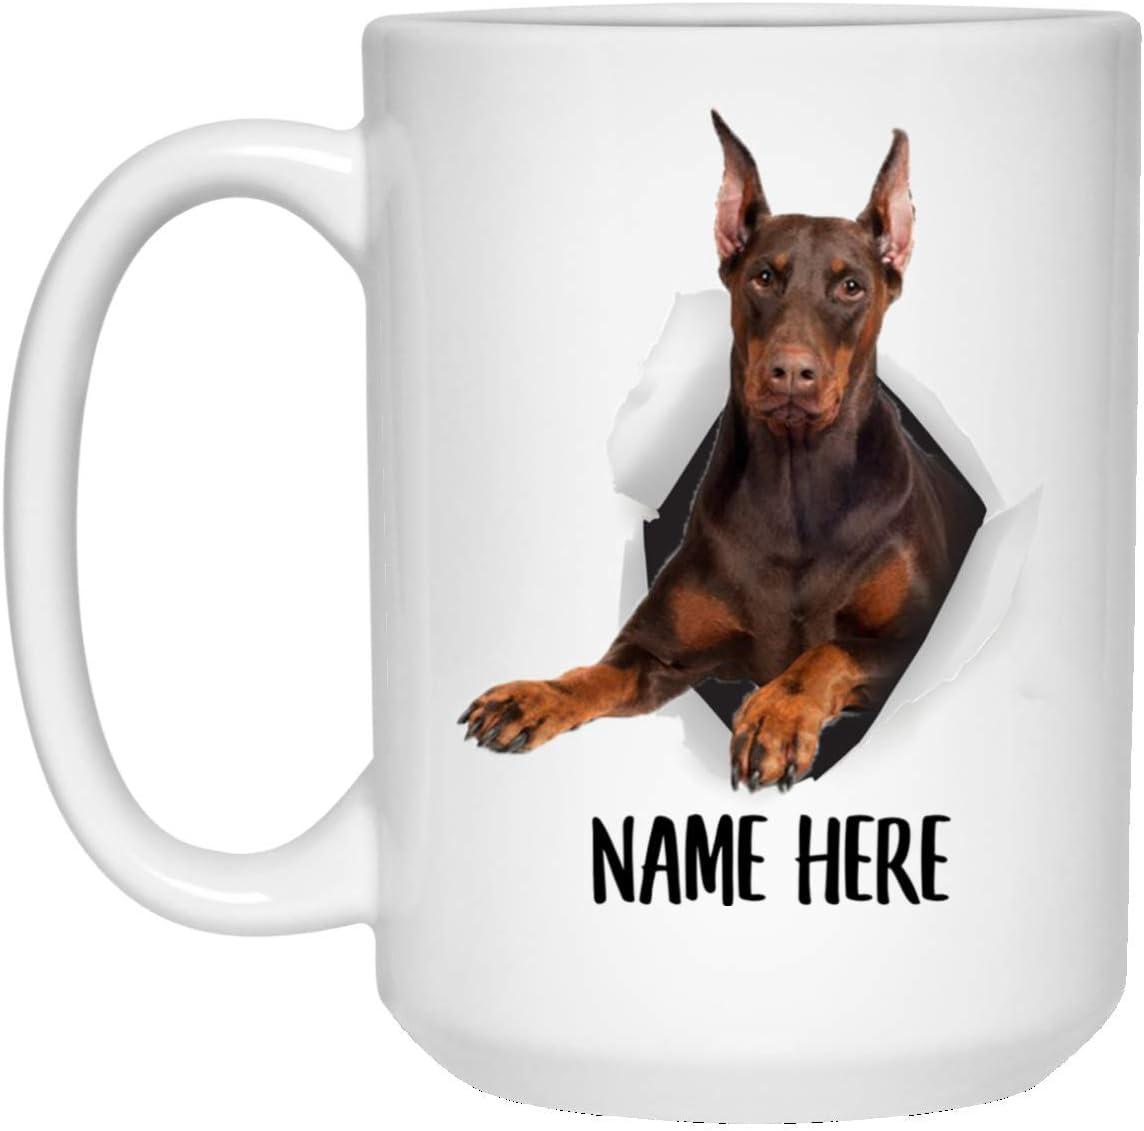 Funny Personalized Name Doberman Pinscher Choco Tan Custom Text Coffee Mug White 15oz Kitchen Dining